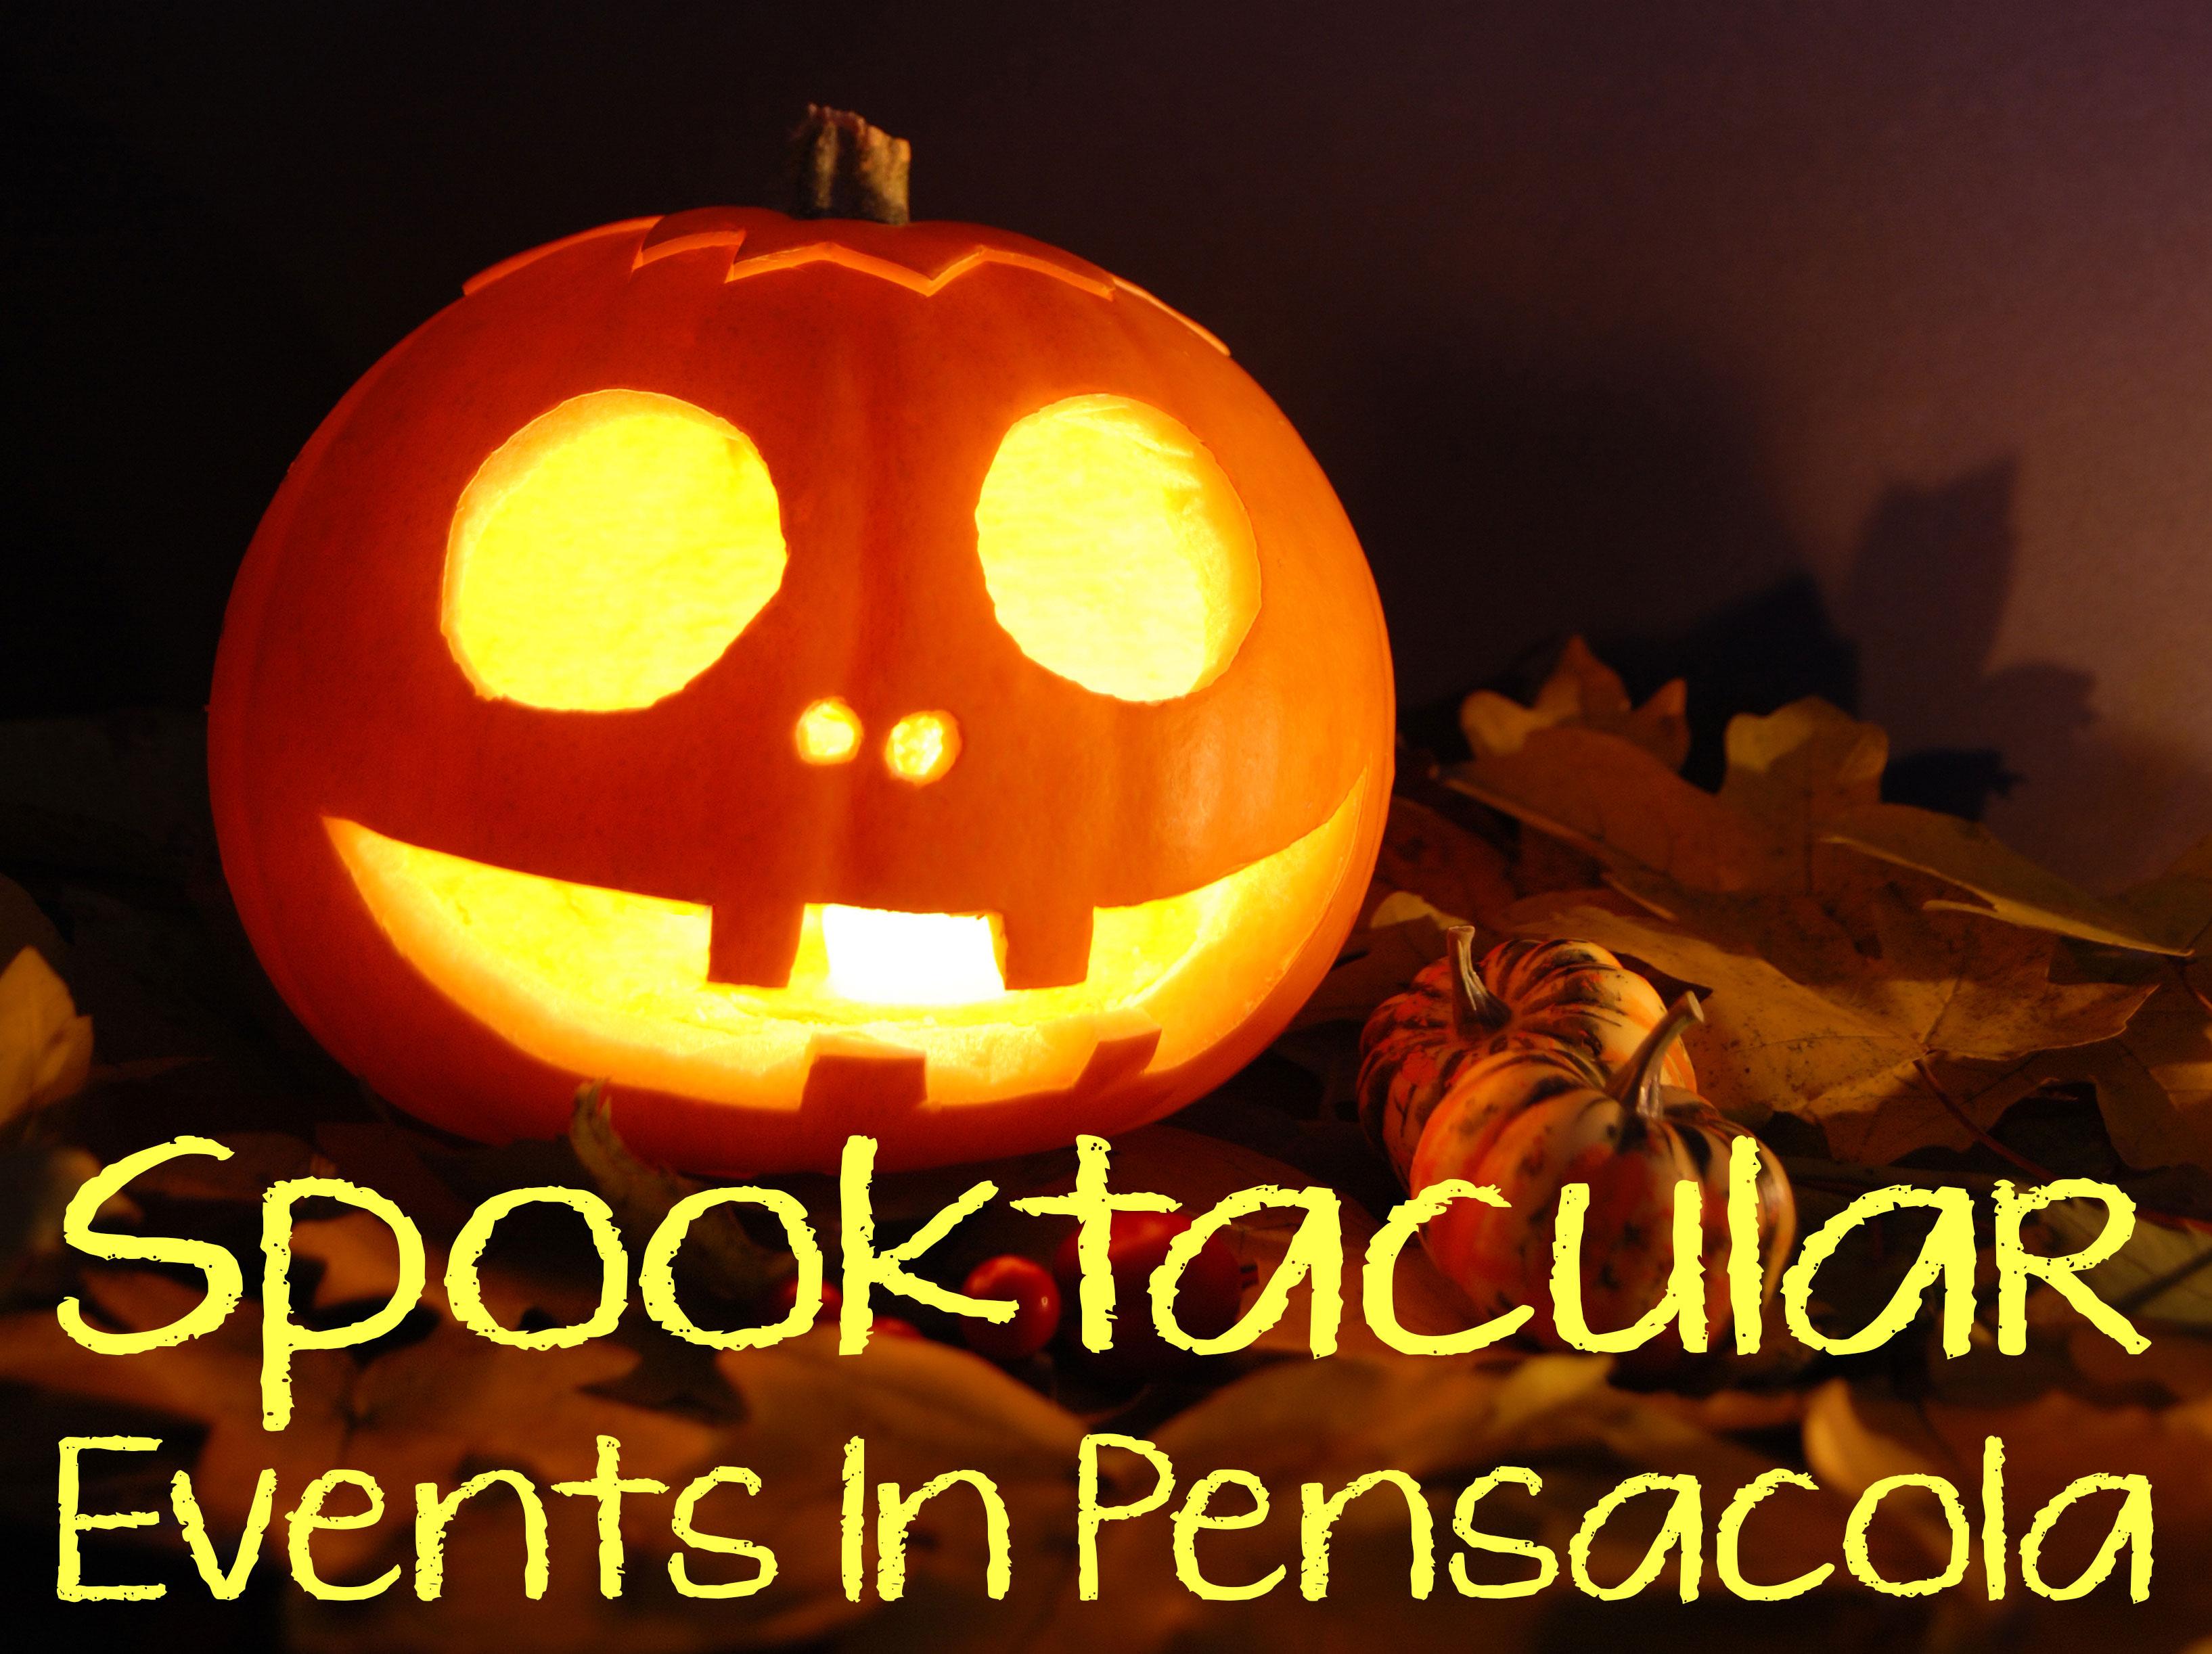 Pensacola Halloween Events 2020 Spooktacular Halloween Events in Pensacola